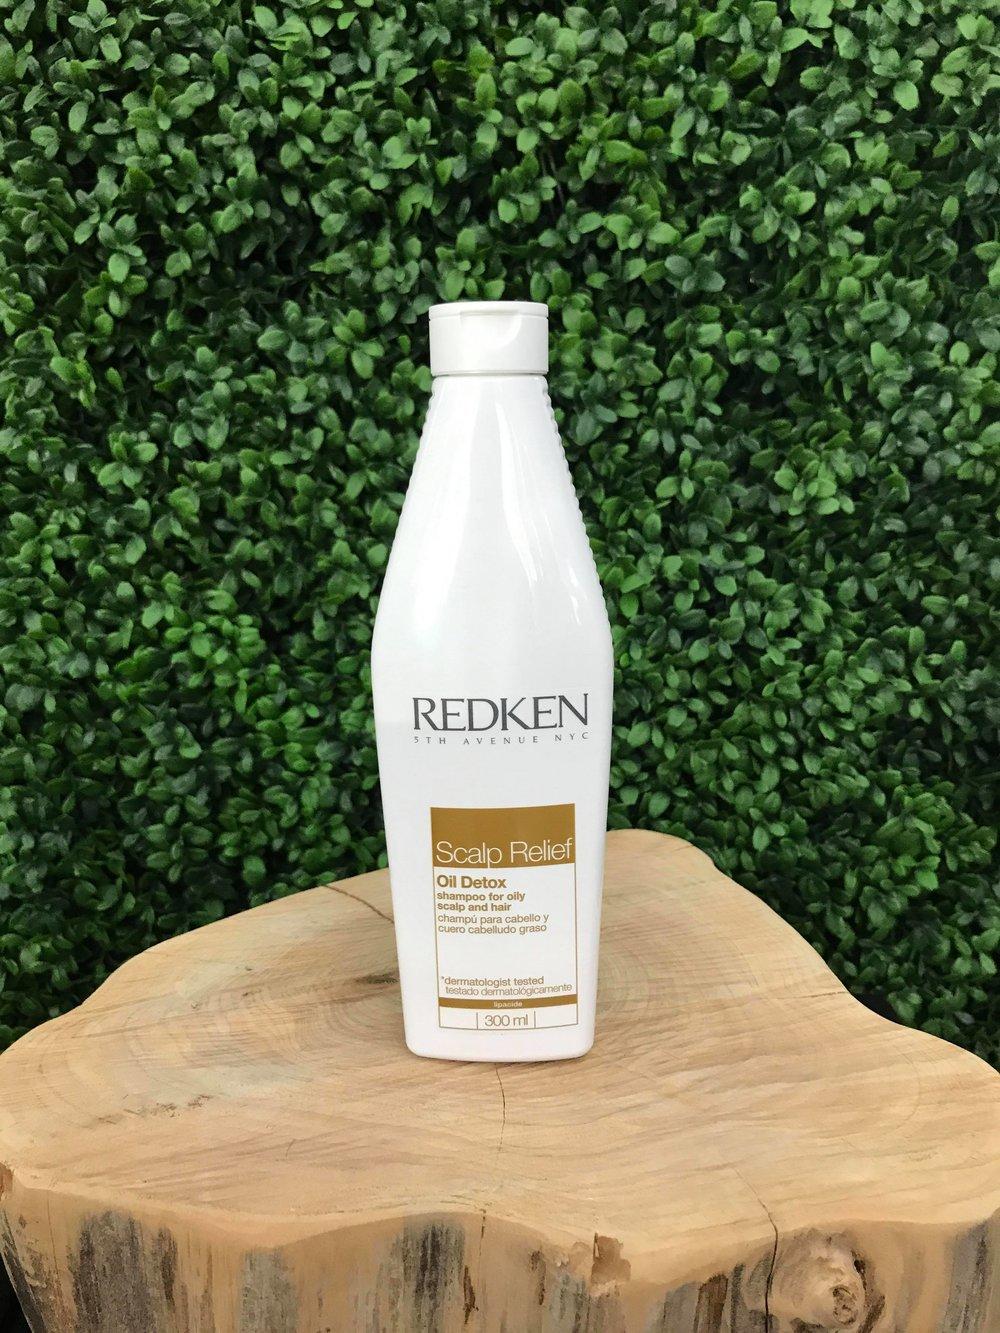 Scalp Relief Oil Detox 300ml - $35.00